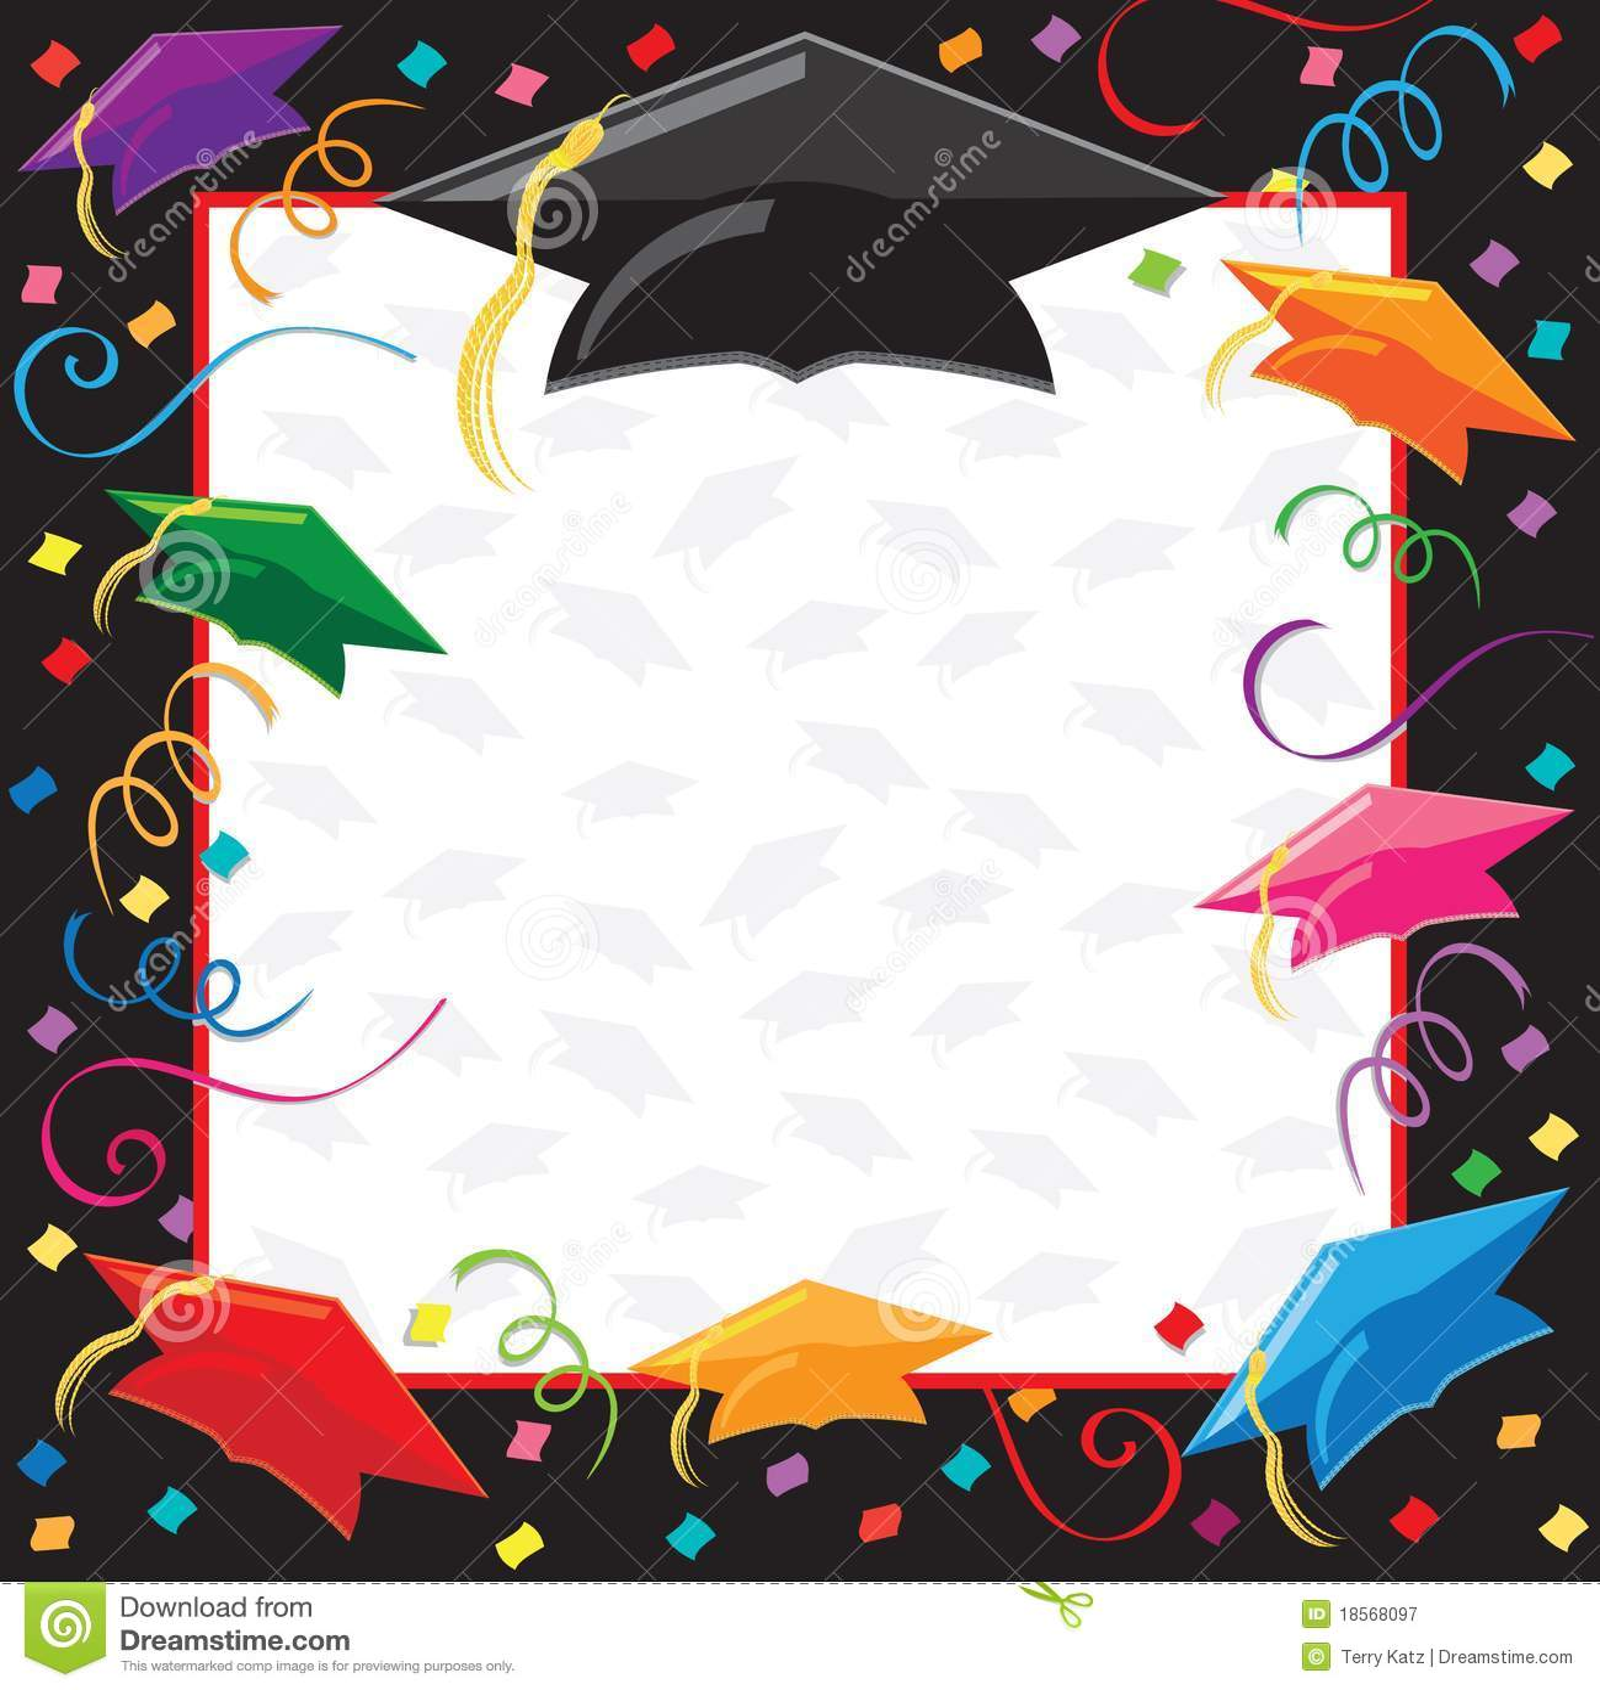 College Graduation Party Invitations Templates | alesi.info